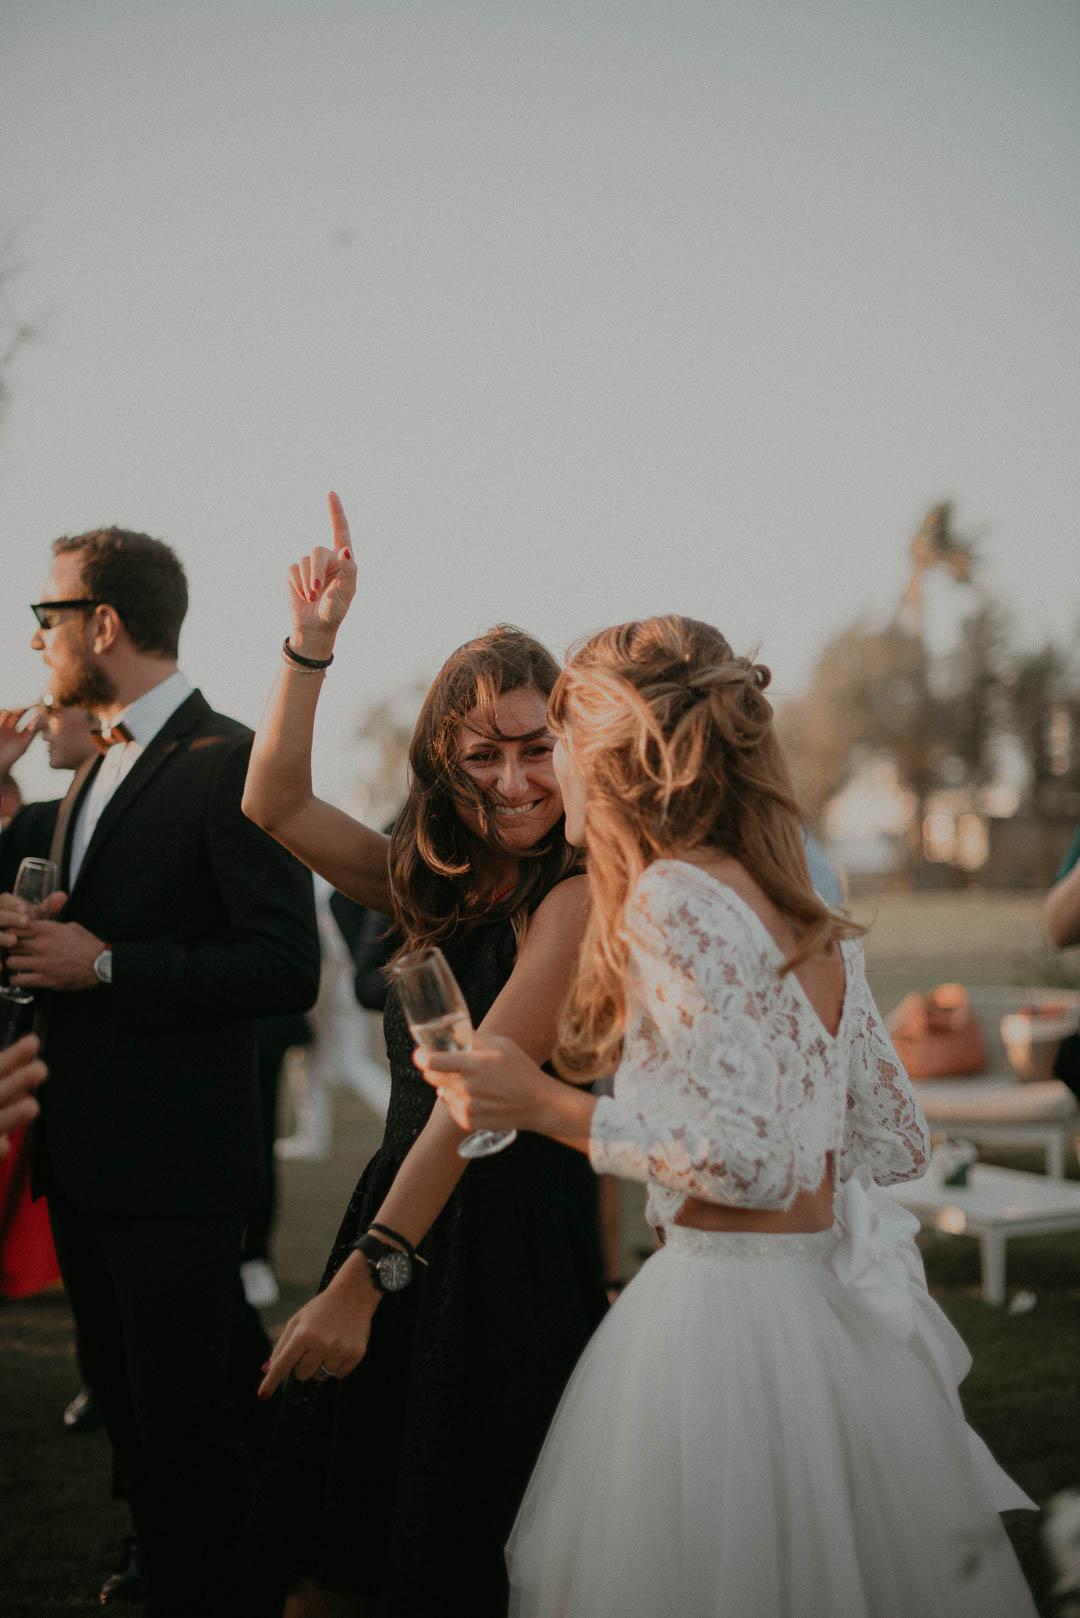 wedding-photographer-destination-fineart-bespoke-reportage-napoli-nabilah-vivianeizzo-spazio46-106